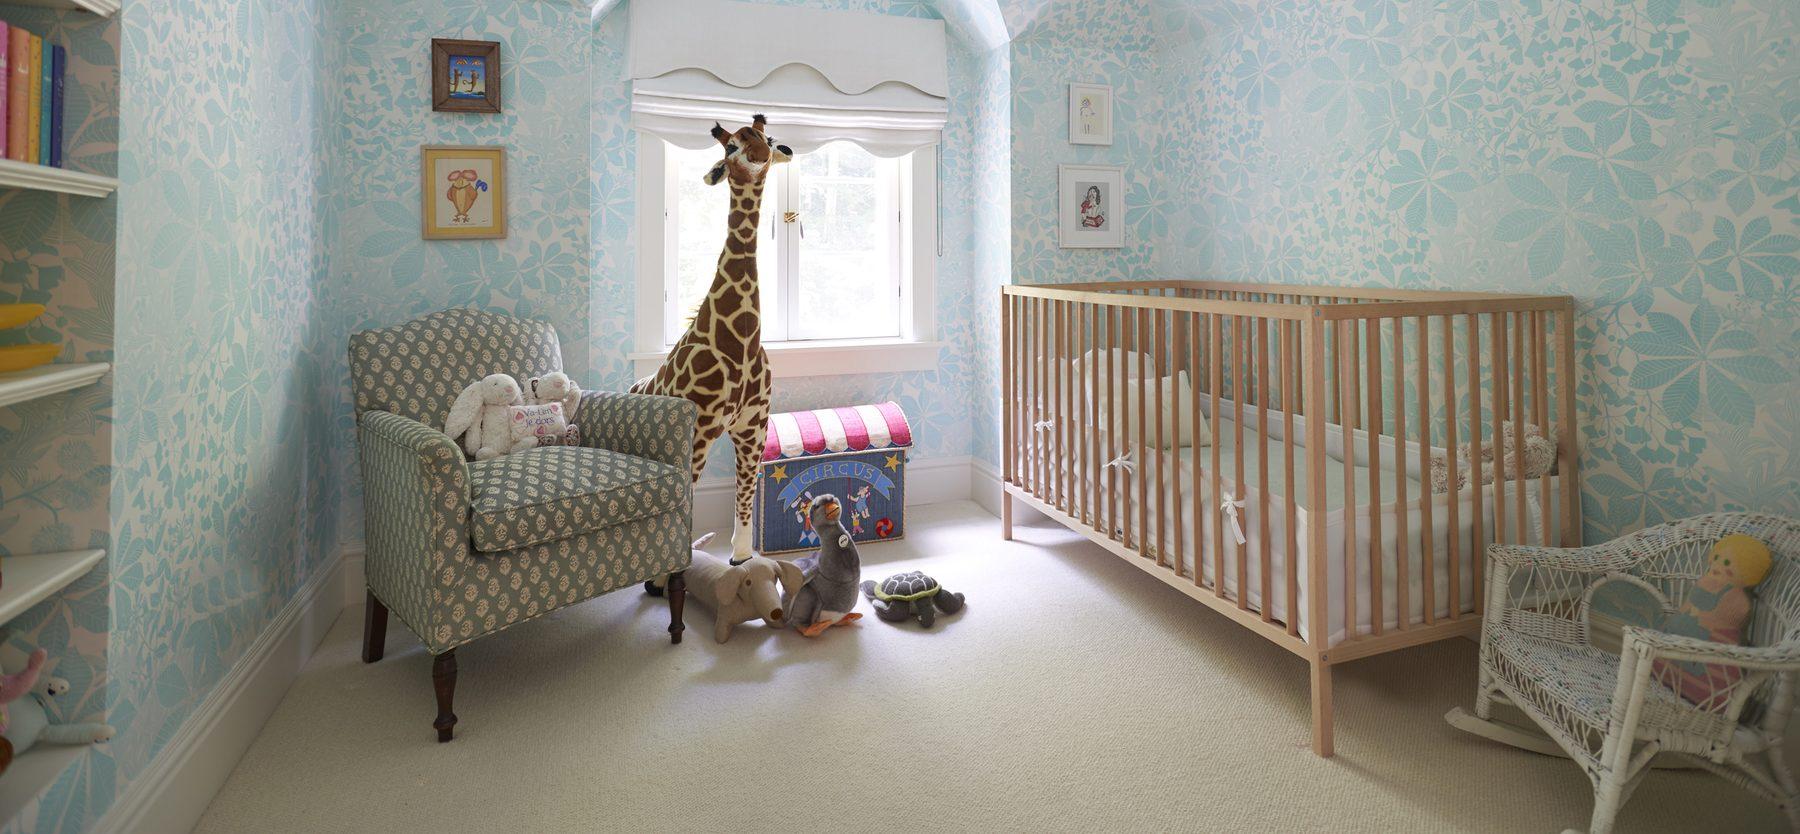 Asia Baker's Nursery